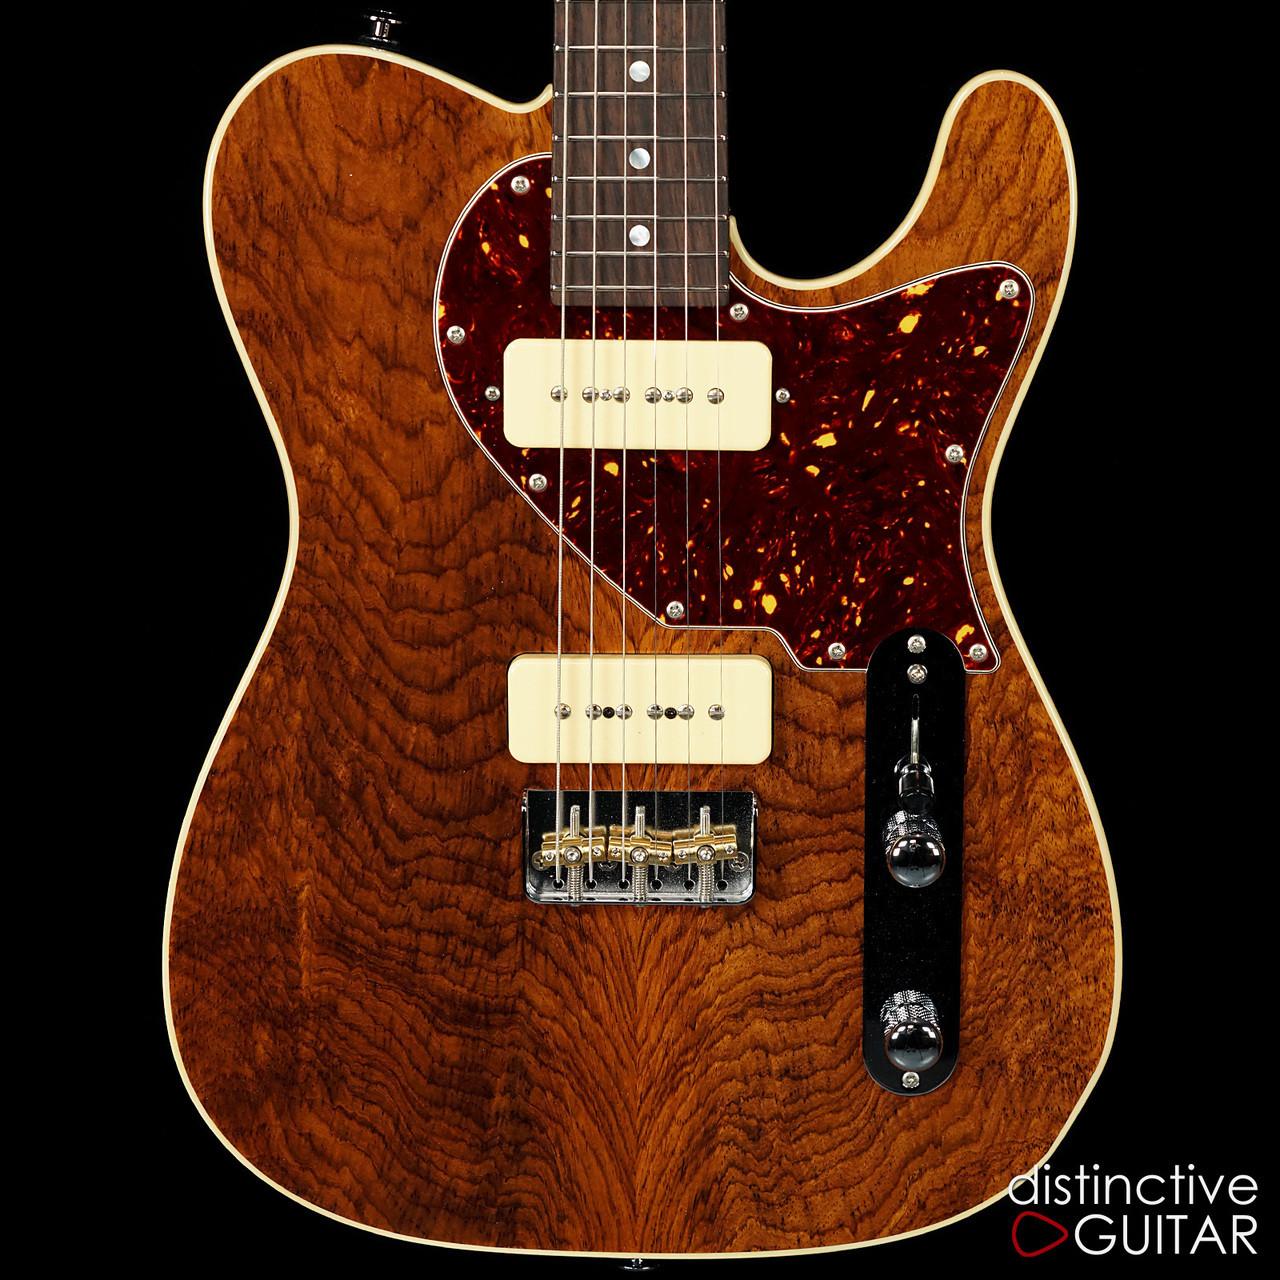 Suhr Classic T Wiring Diagram Guitar Custom Limited P90 Guatemalan Rosewood Natural Gloss Rh Distinctiveguitar Com Telecaster Middle Pickup